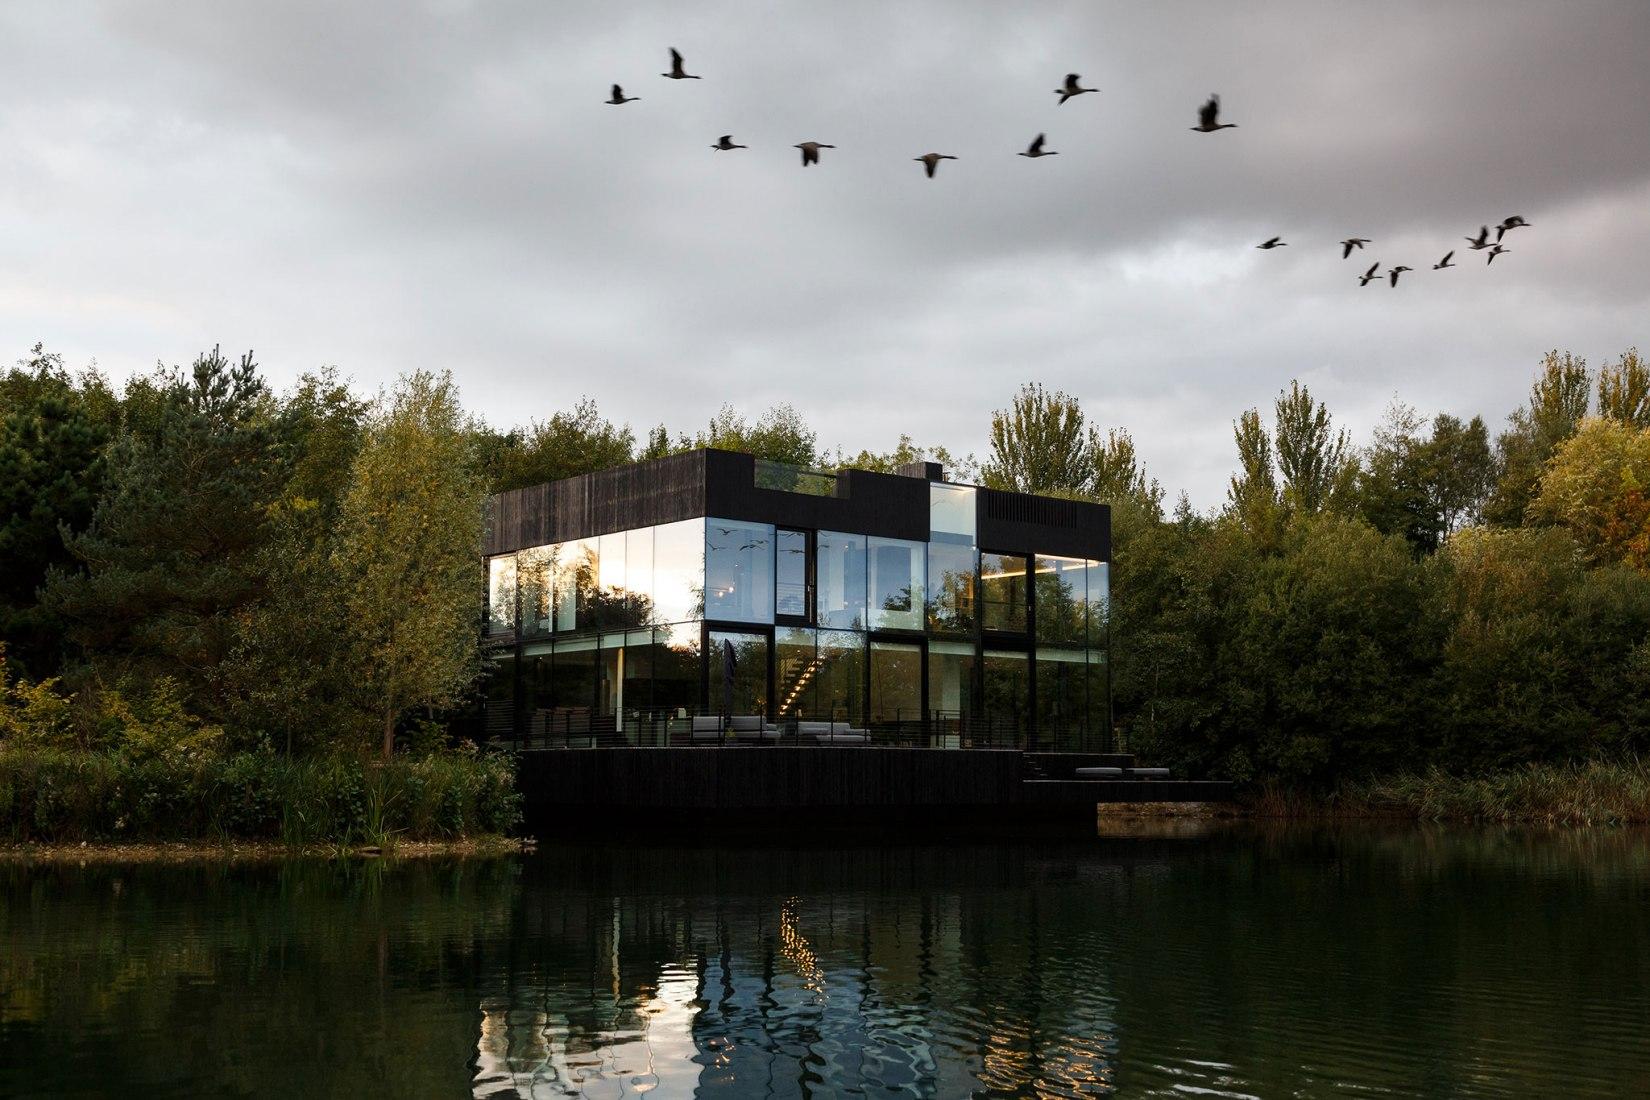 Villa on the lake by Mecanoo architecten. Photograph by mariashot.photo